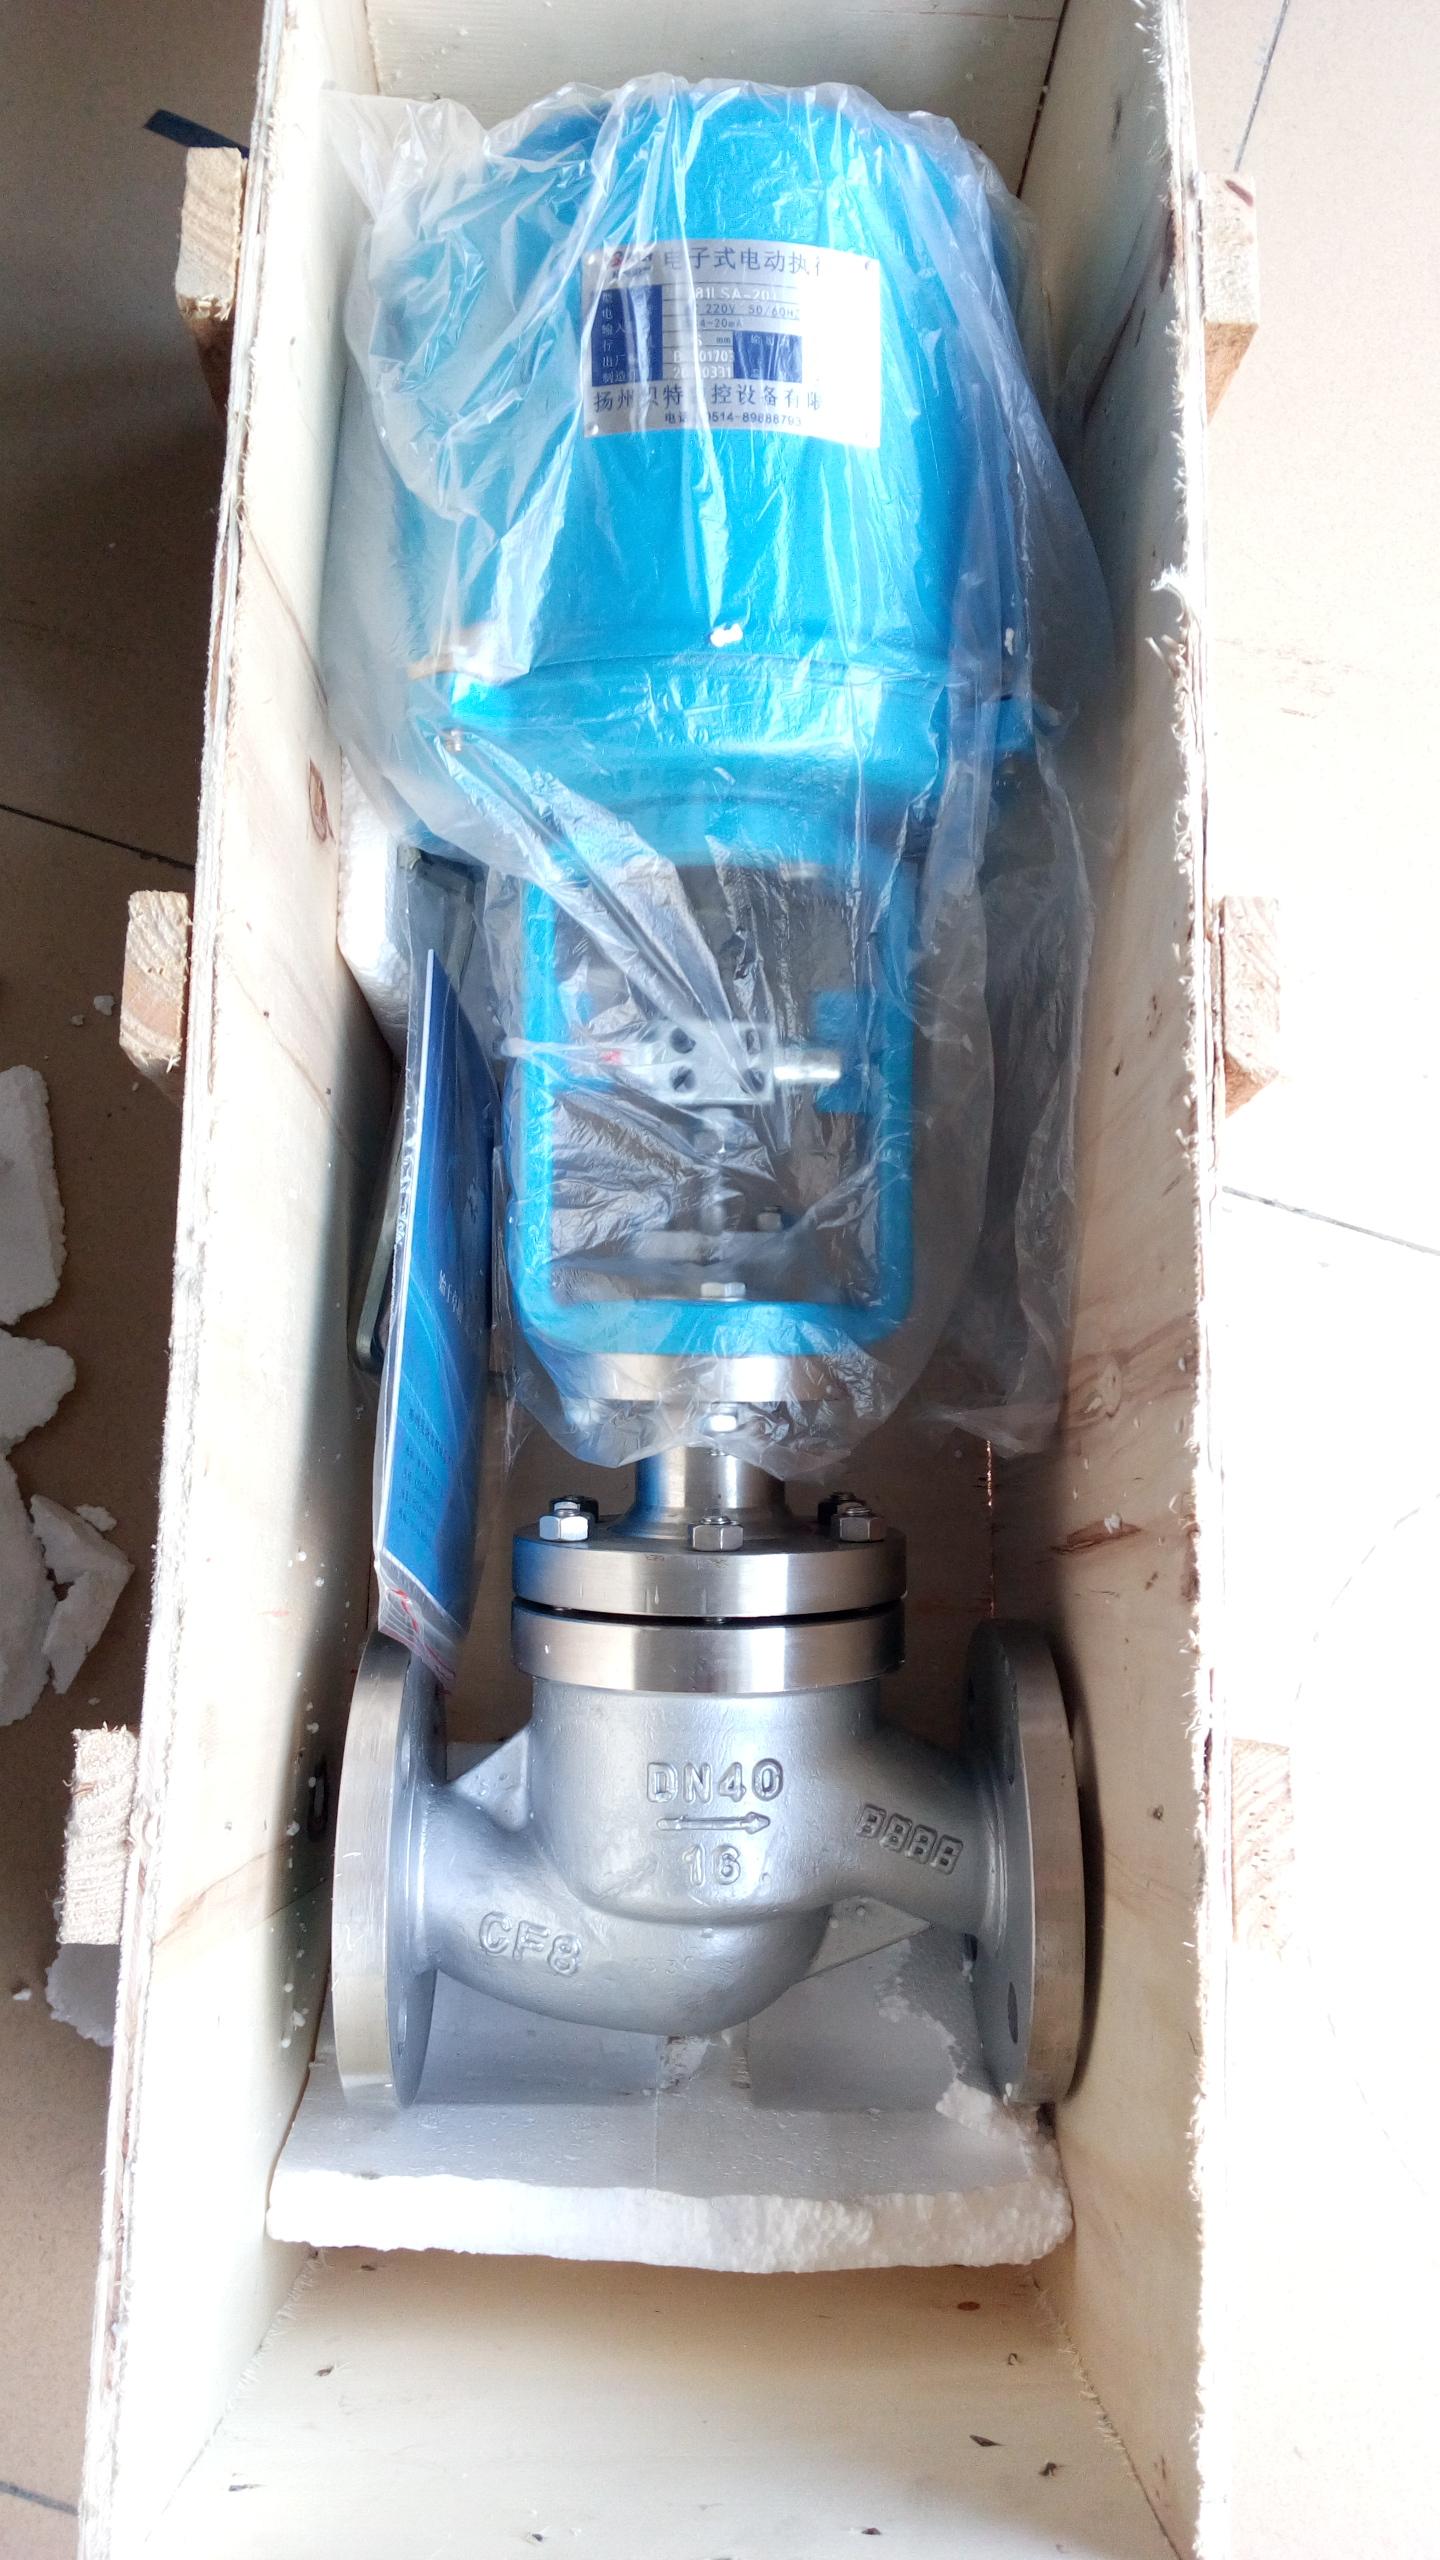 рукав ZDLM-16C электрический регулирующий клапан 4-20MA паровой клапан регулирования стока воды DN20DN25